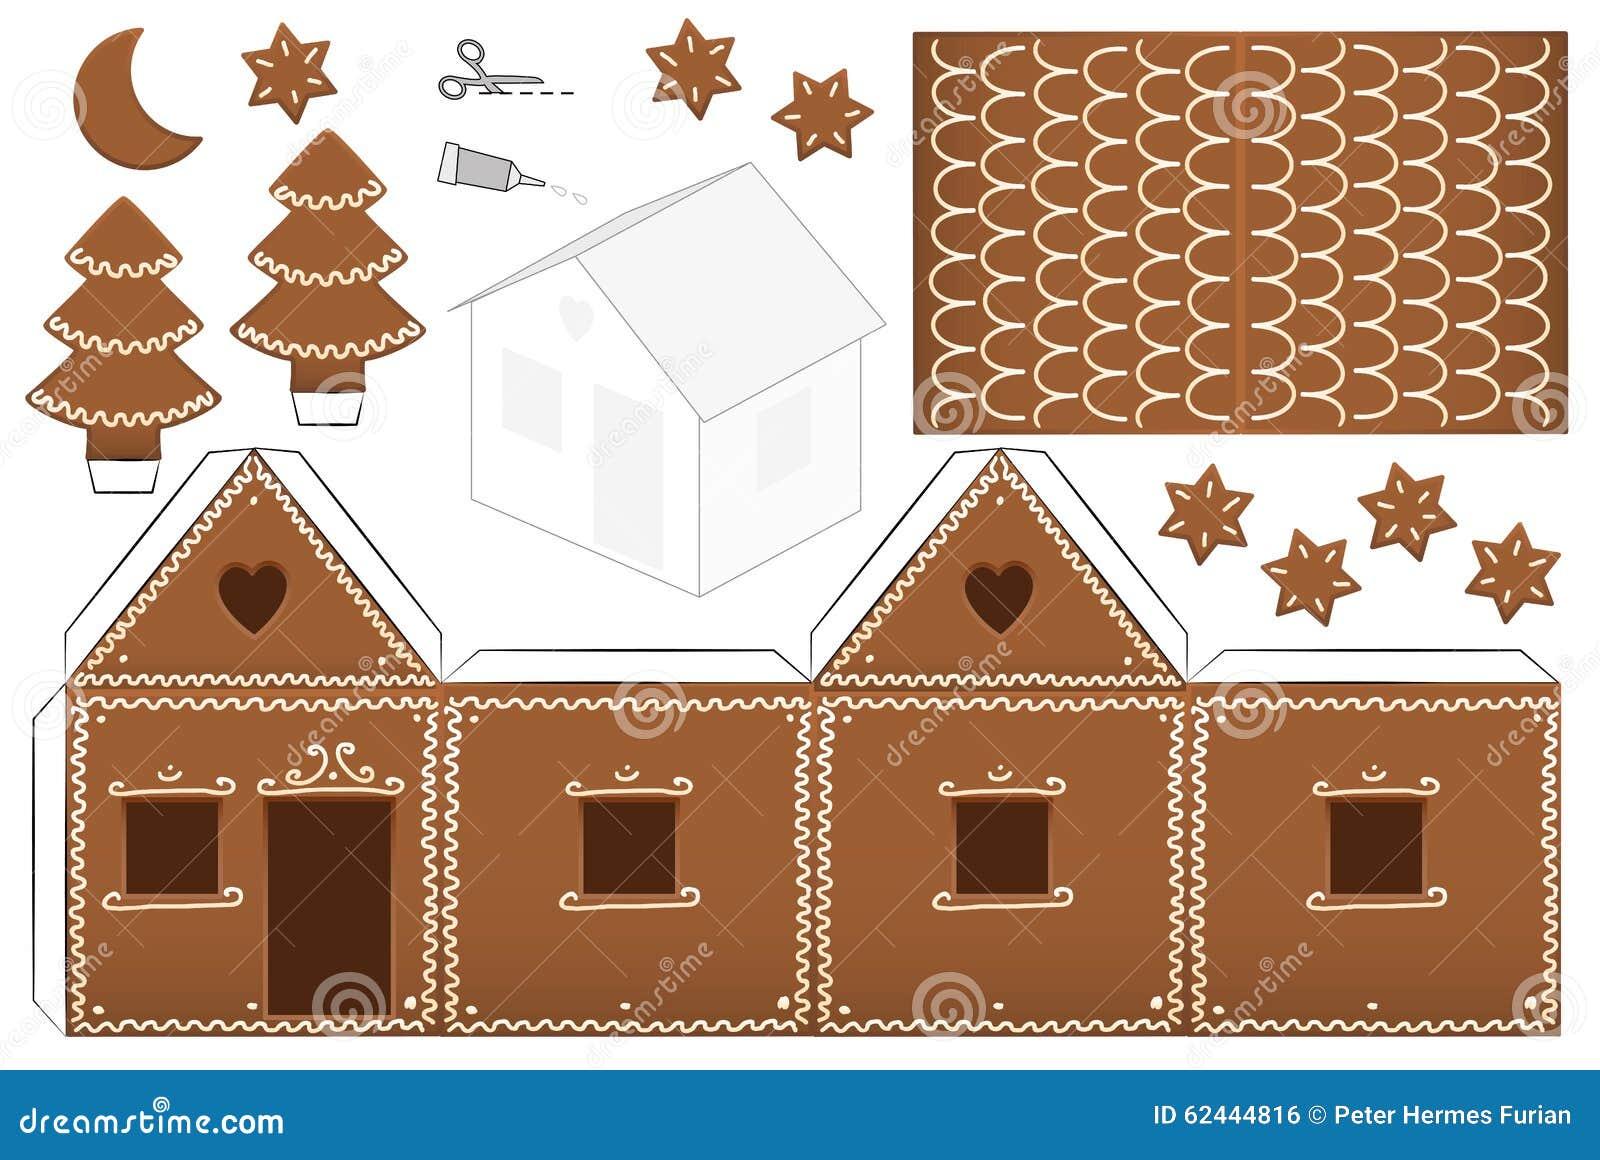 Lebkuchen Haus Papier Modell Vektor Abbildung